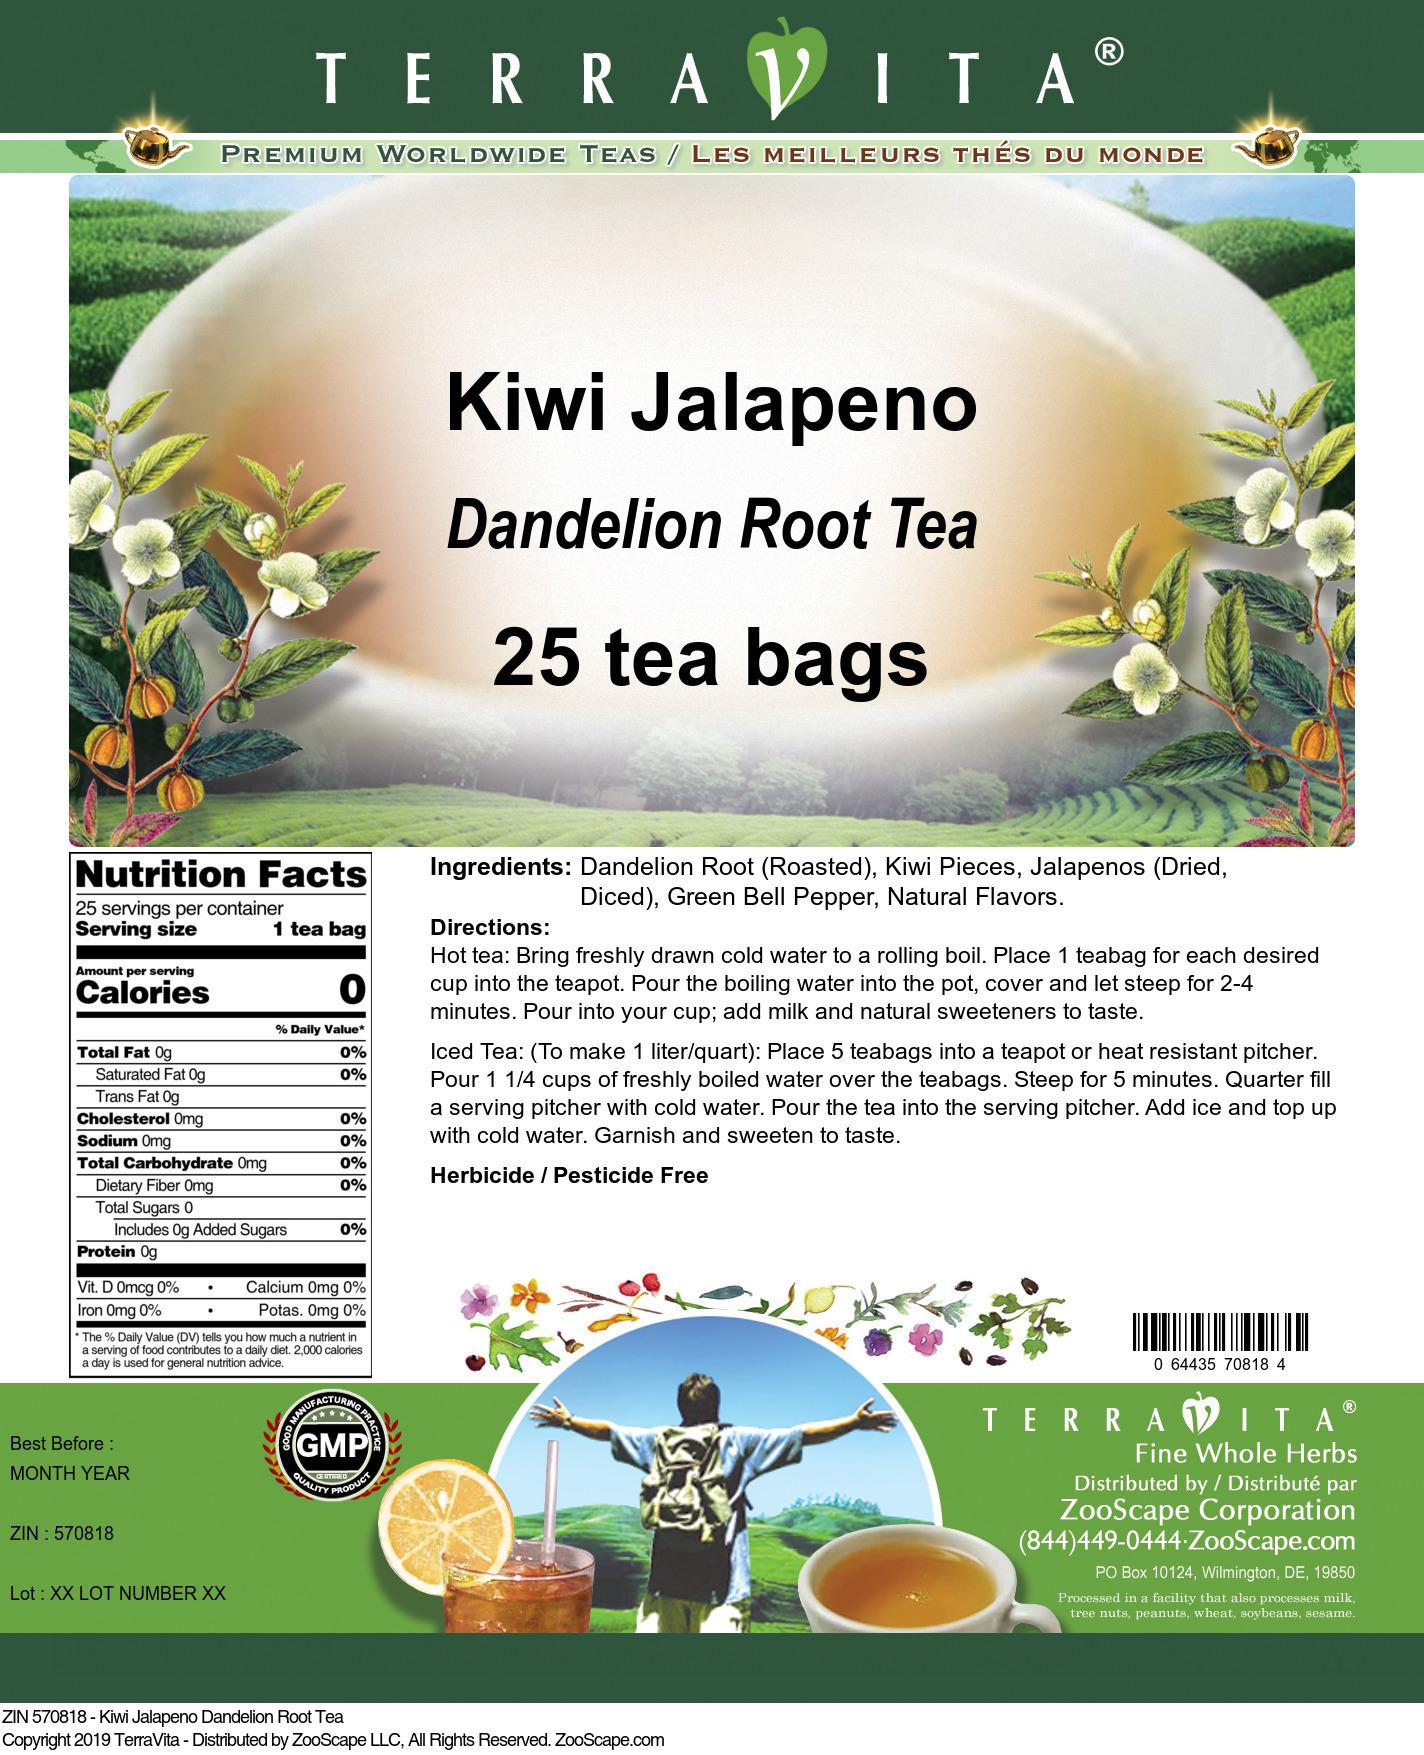 Kiwi Jalapeno Dandelion Root